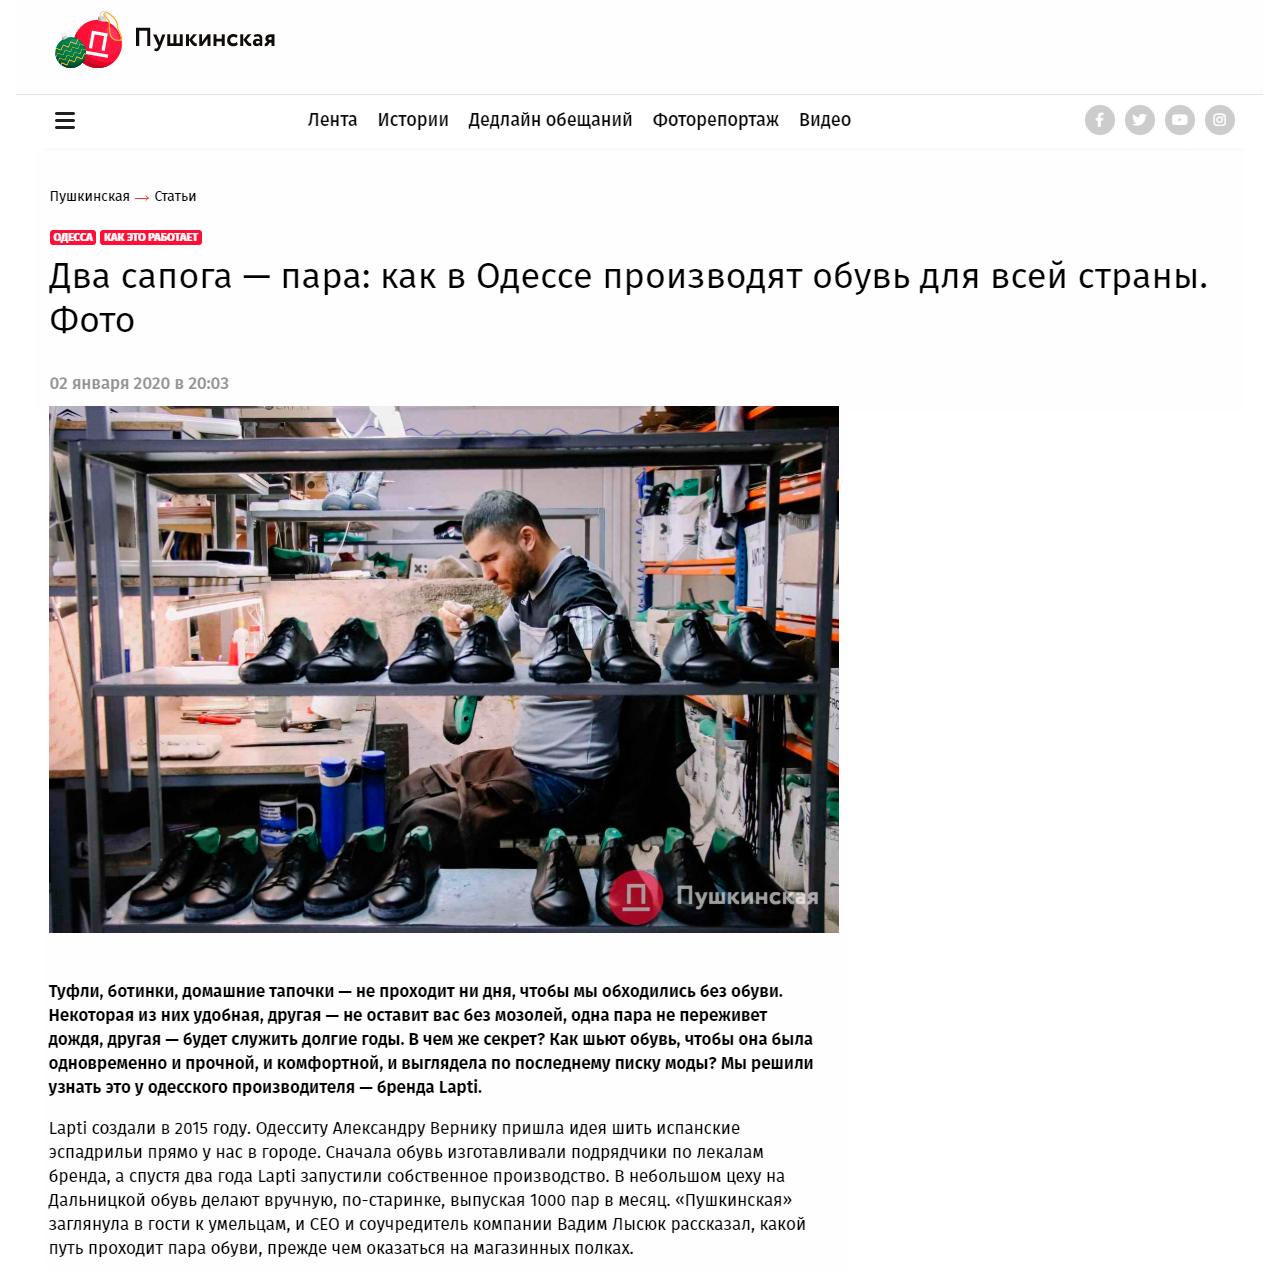 Пушкінська про виробництво взуття L.A.P.T.I.